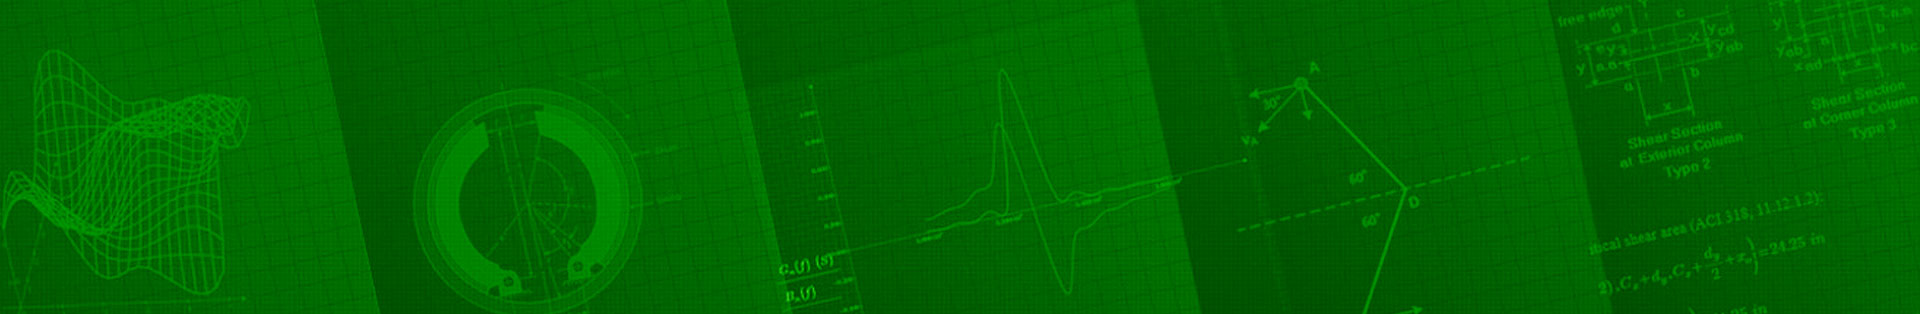 Mathcad Prime 3.0 Download